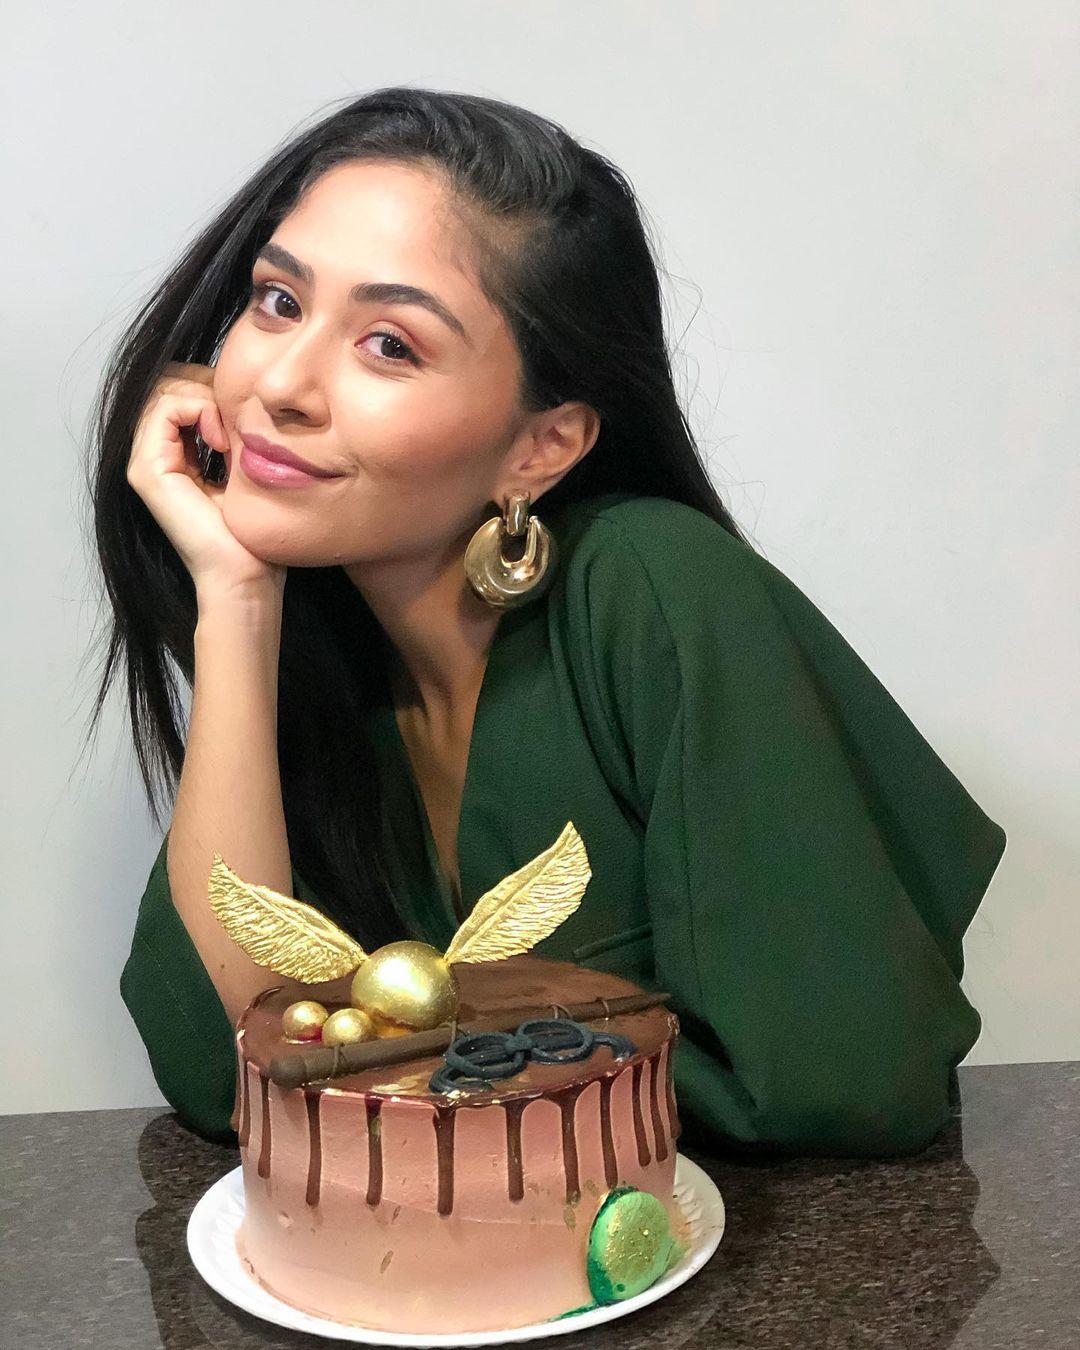 thaisi dias, miss madeira mamore mundo 2019. Dfsft10